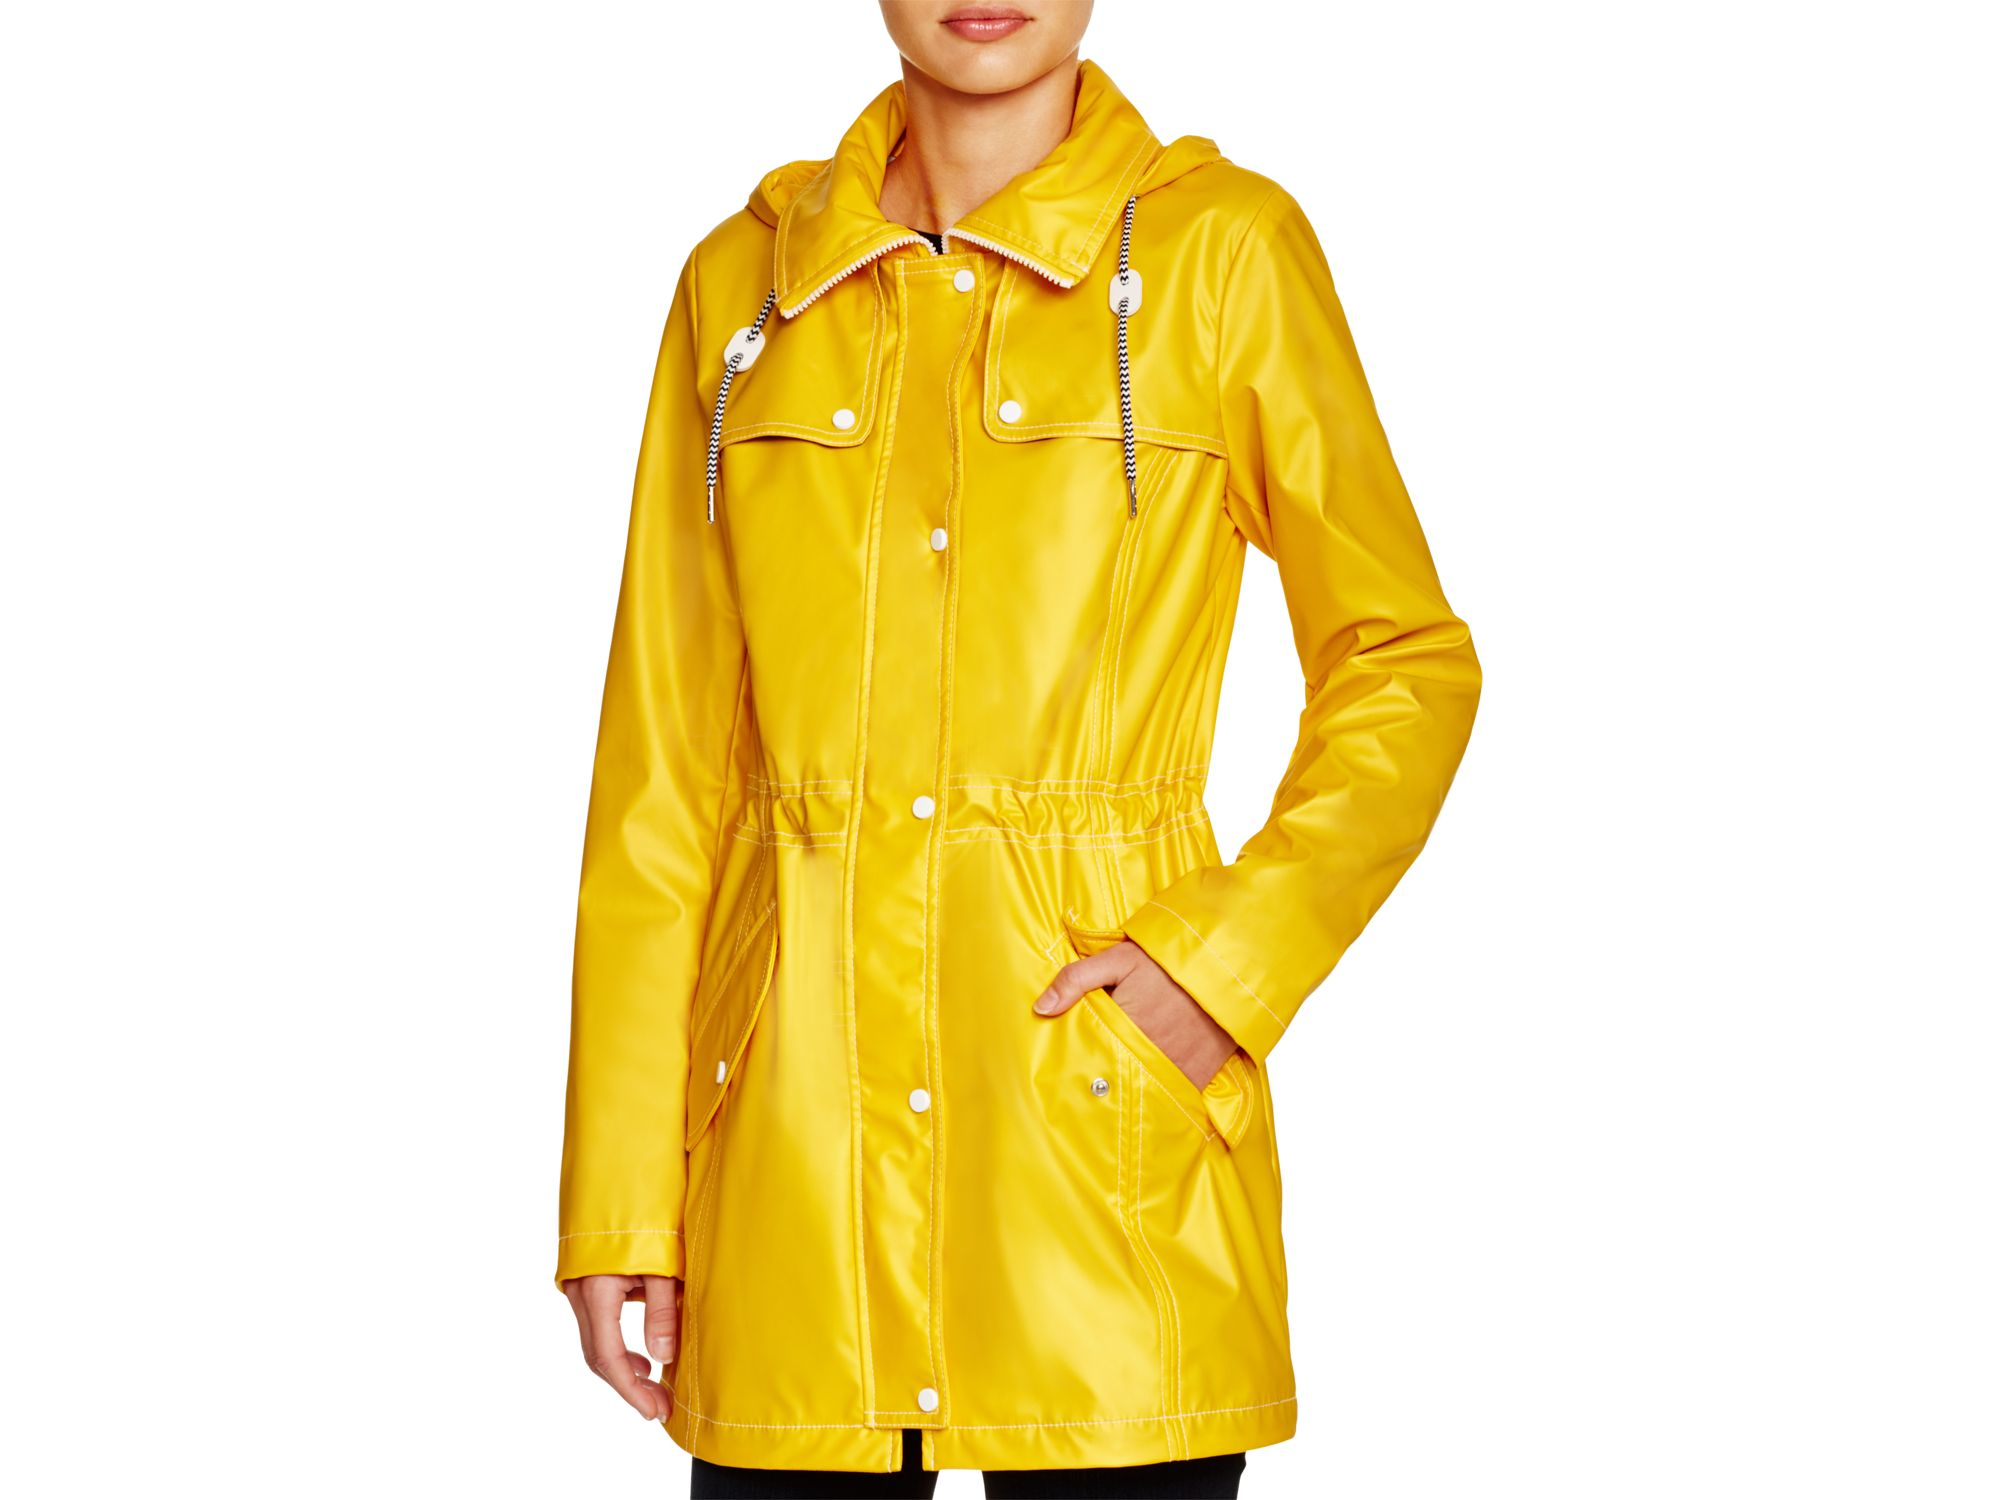 2645571f4f241 Jessica Simpson Hooded Rain Slicker - Compare At $160 in Yellow - Lyst